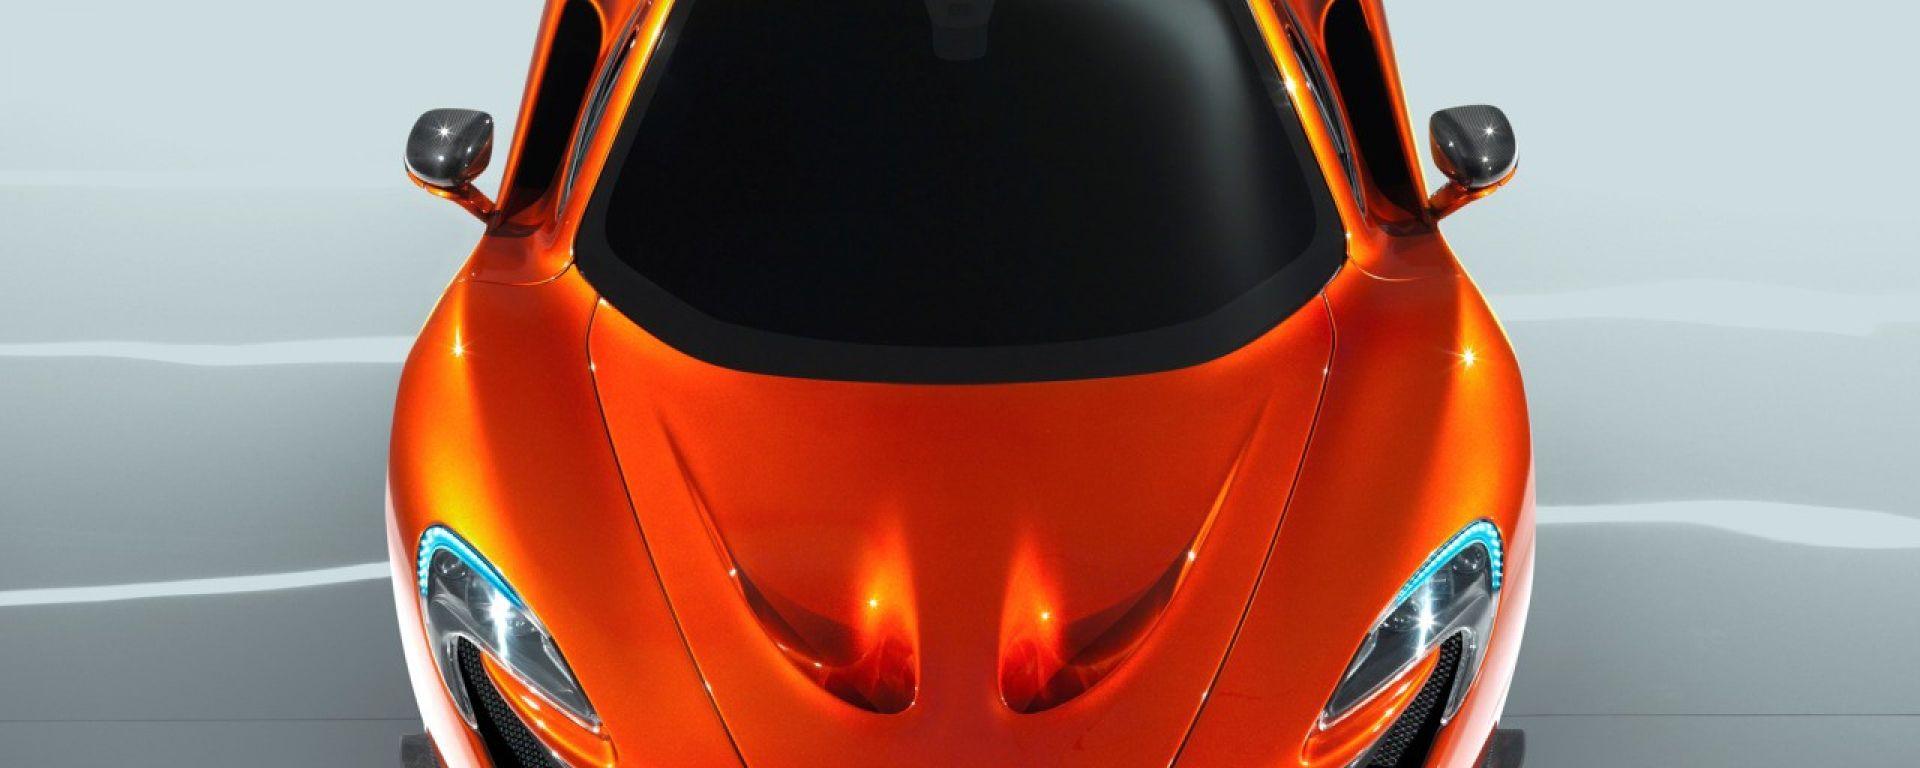 McLaren P1, nuove immagini ufficiali